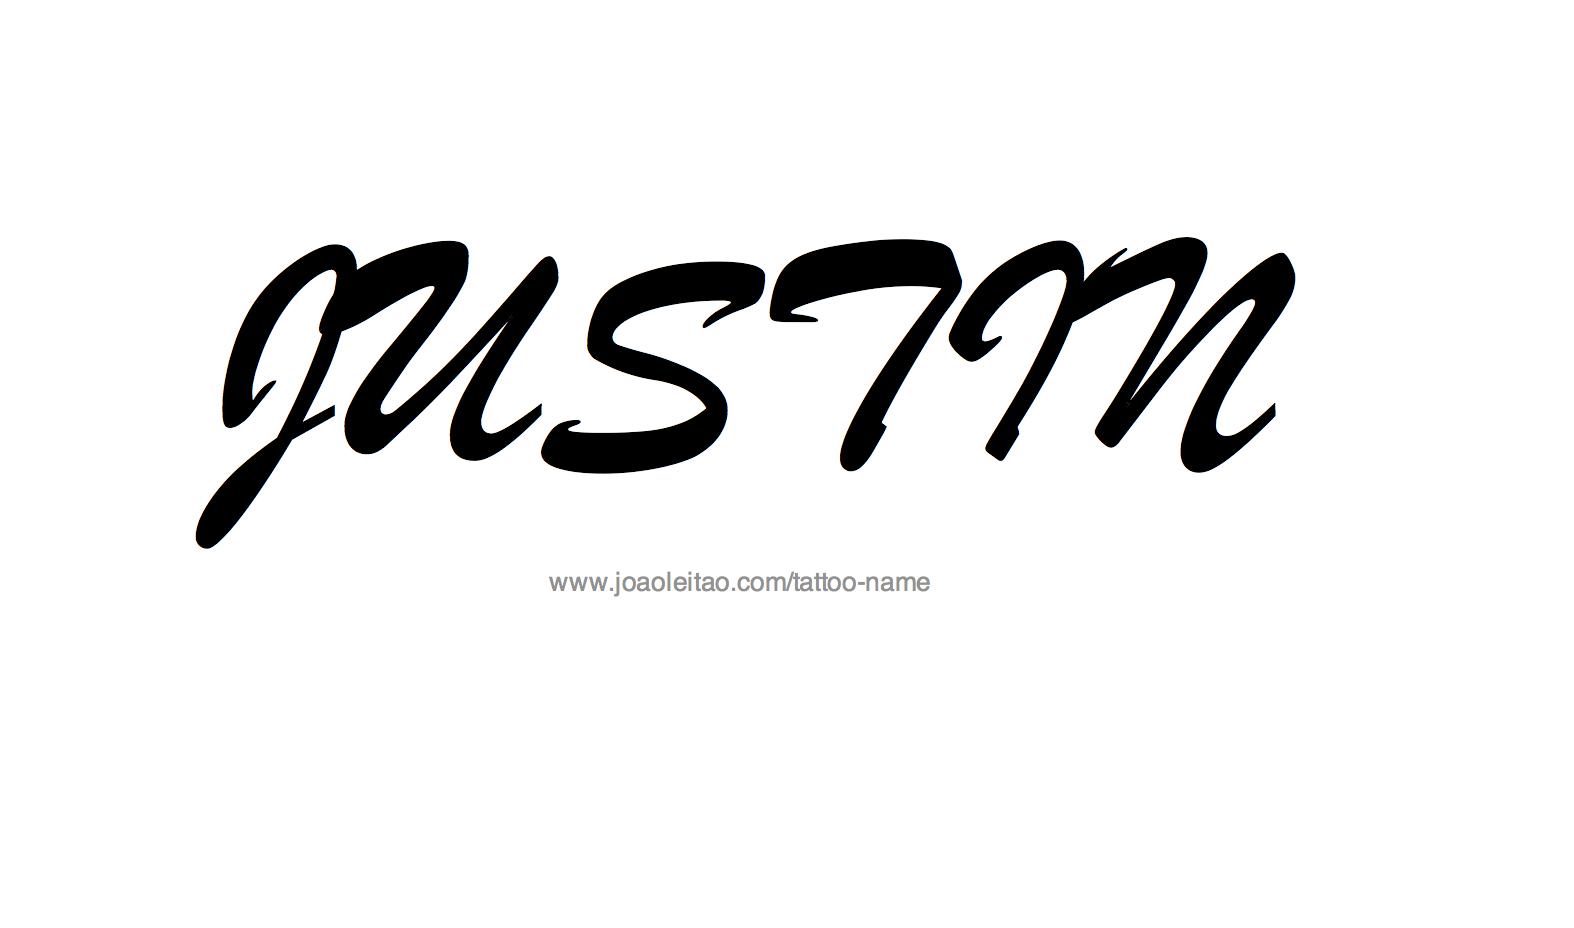 Name Justin Tattoos Tattoo Design Name Justin